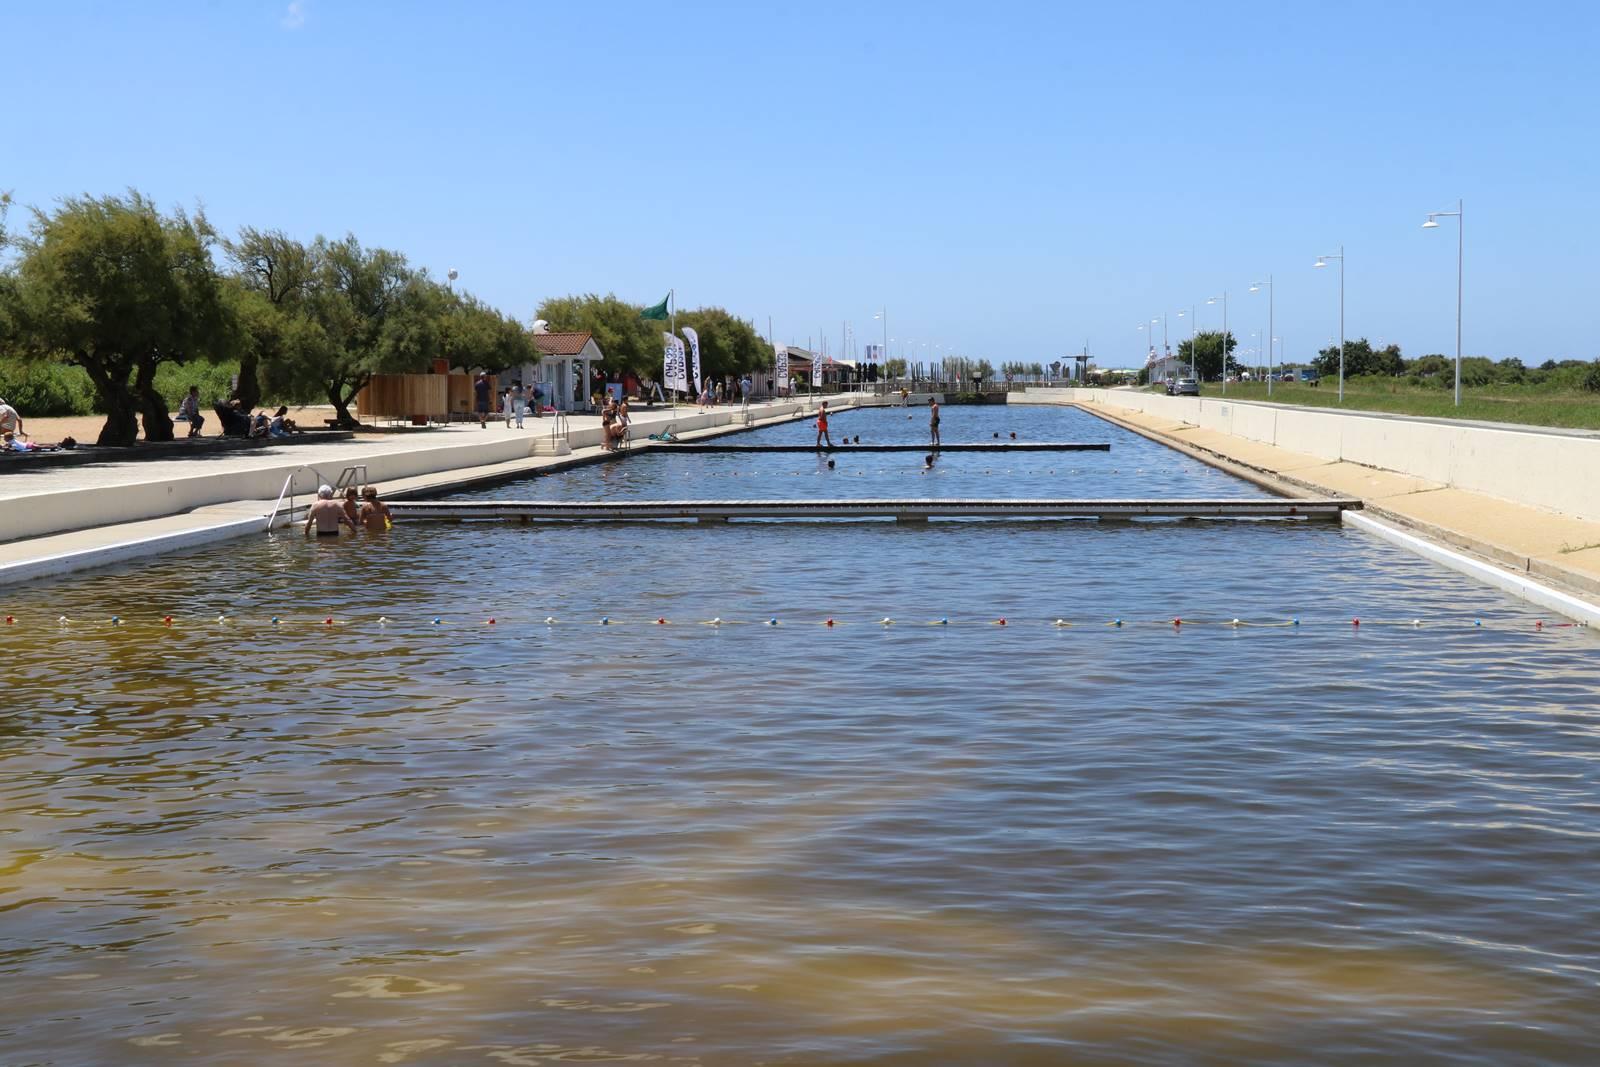 Audenge Bassin d'Arcachon